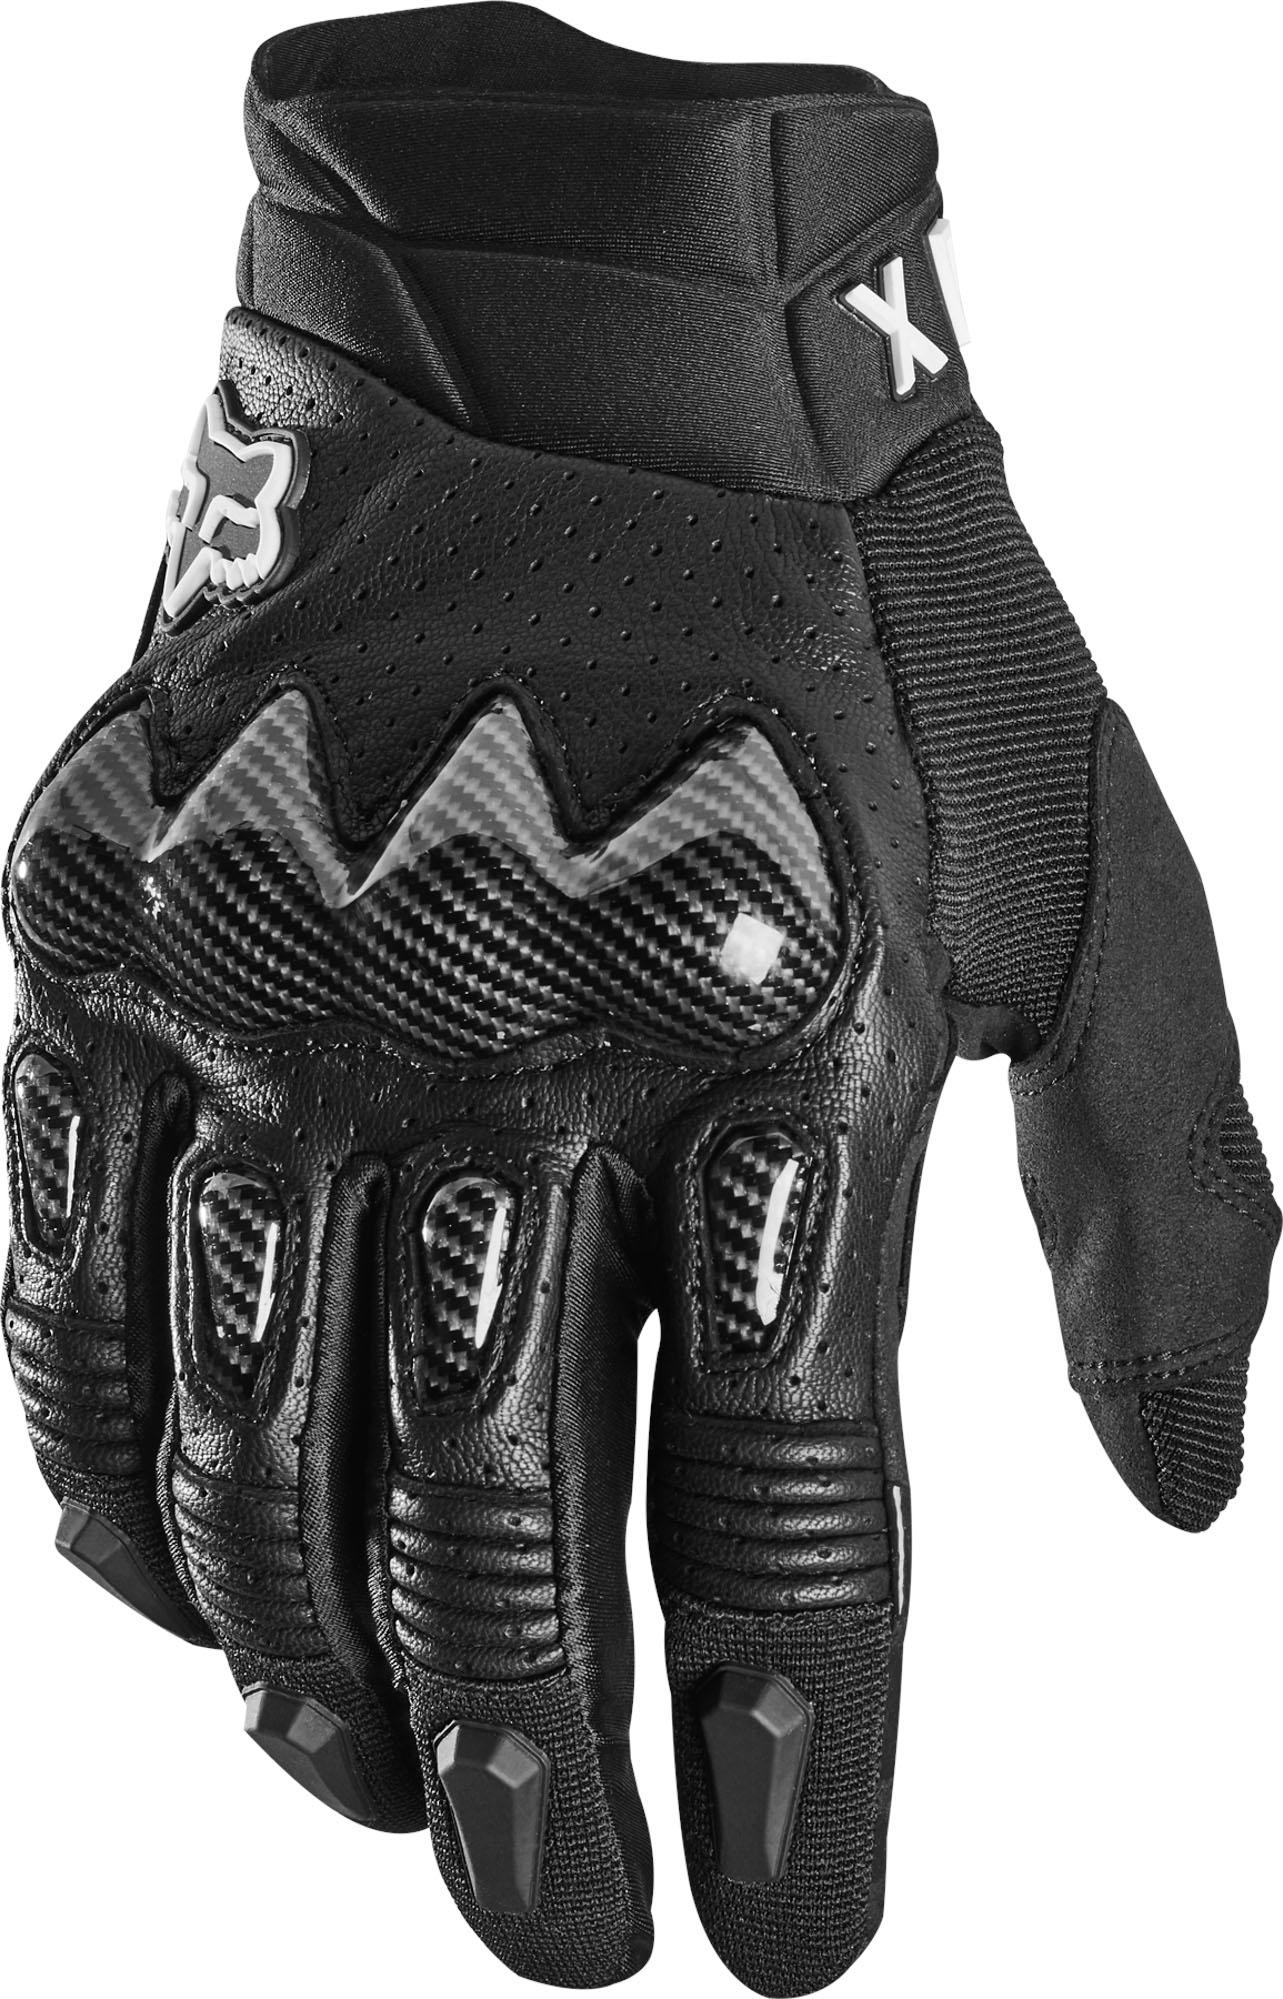 FOX Bomber Glove Ce - Black MX22